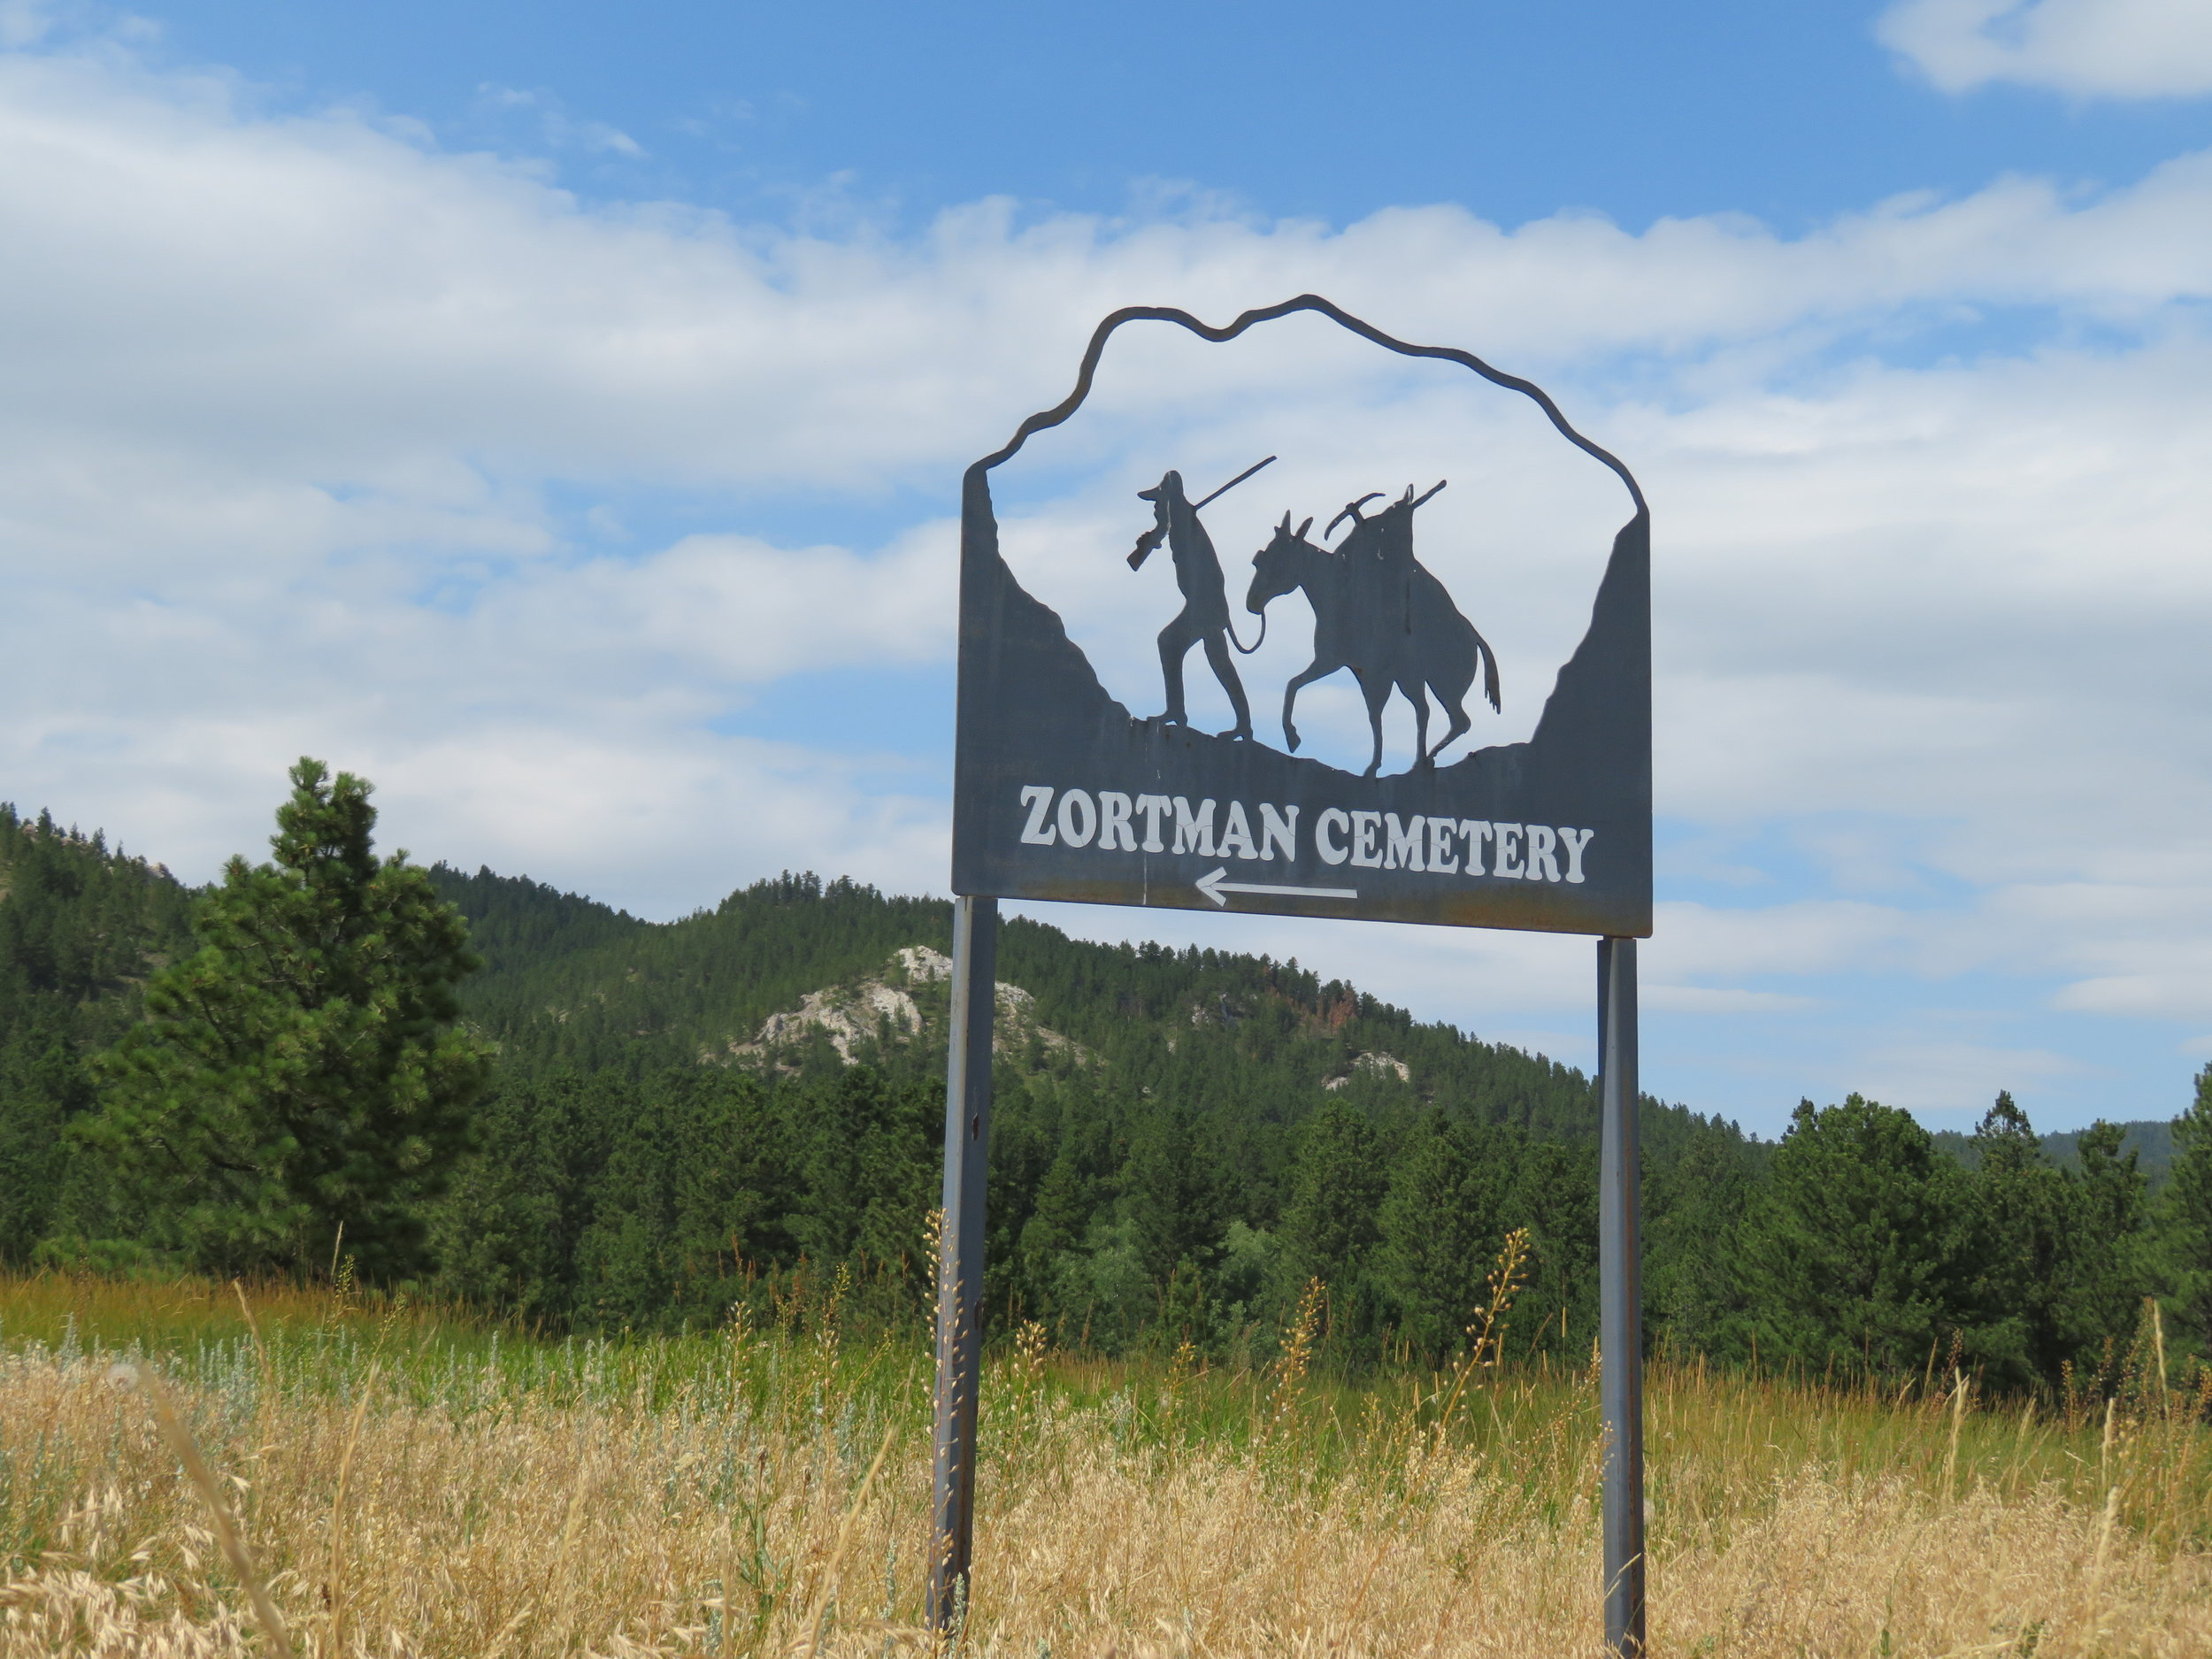 campcreek_zortman cemetery sign.JPG